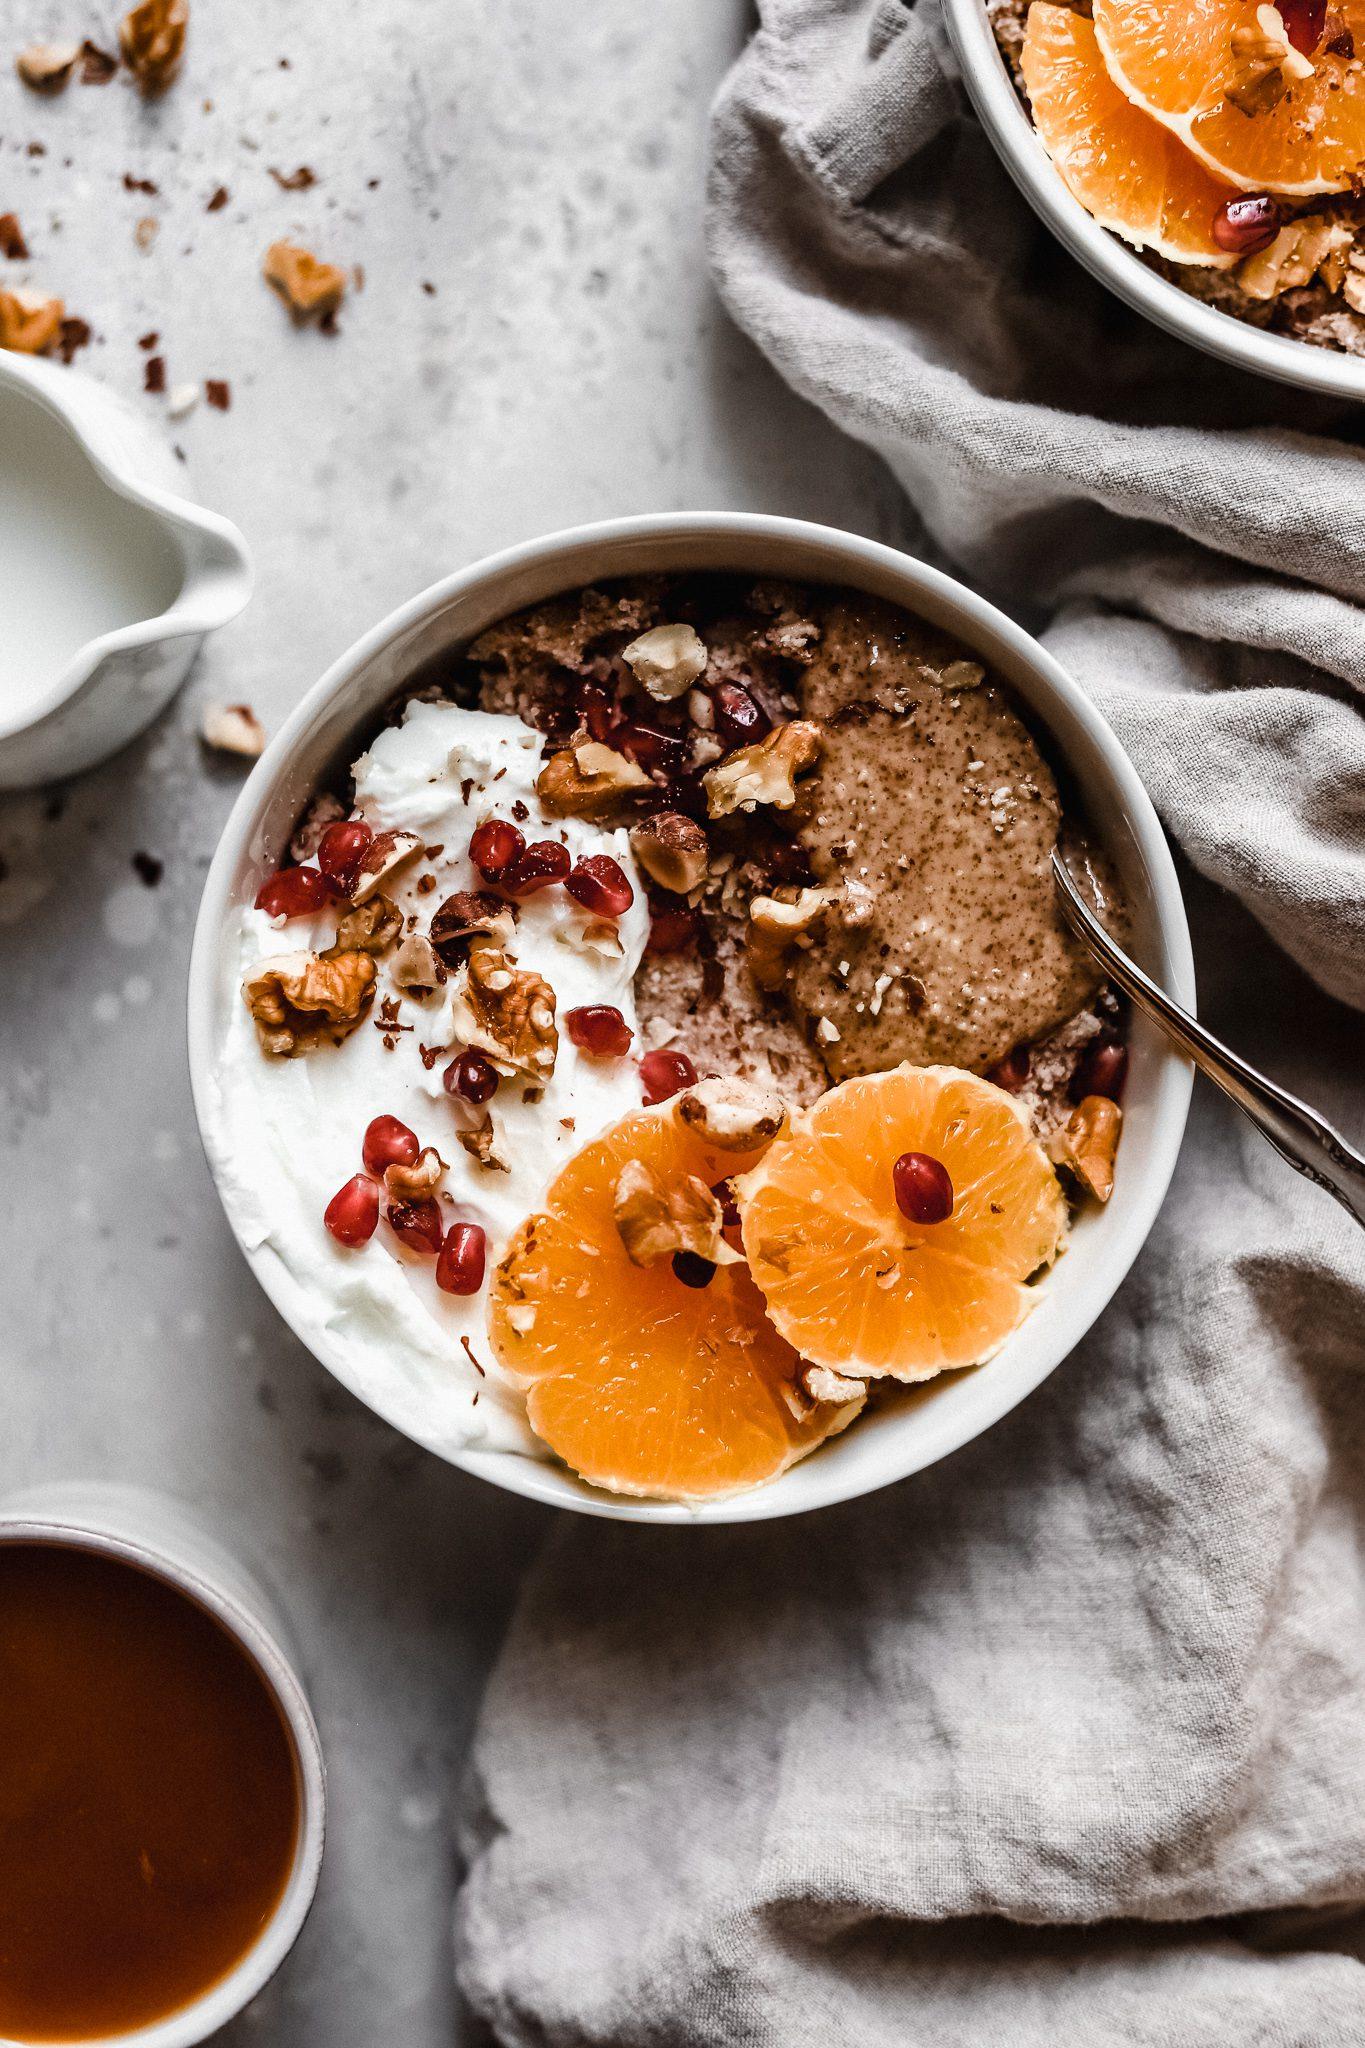 Vegan Grain Free Hot Cereal (Whole30, Paleo, Gluten Free)